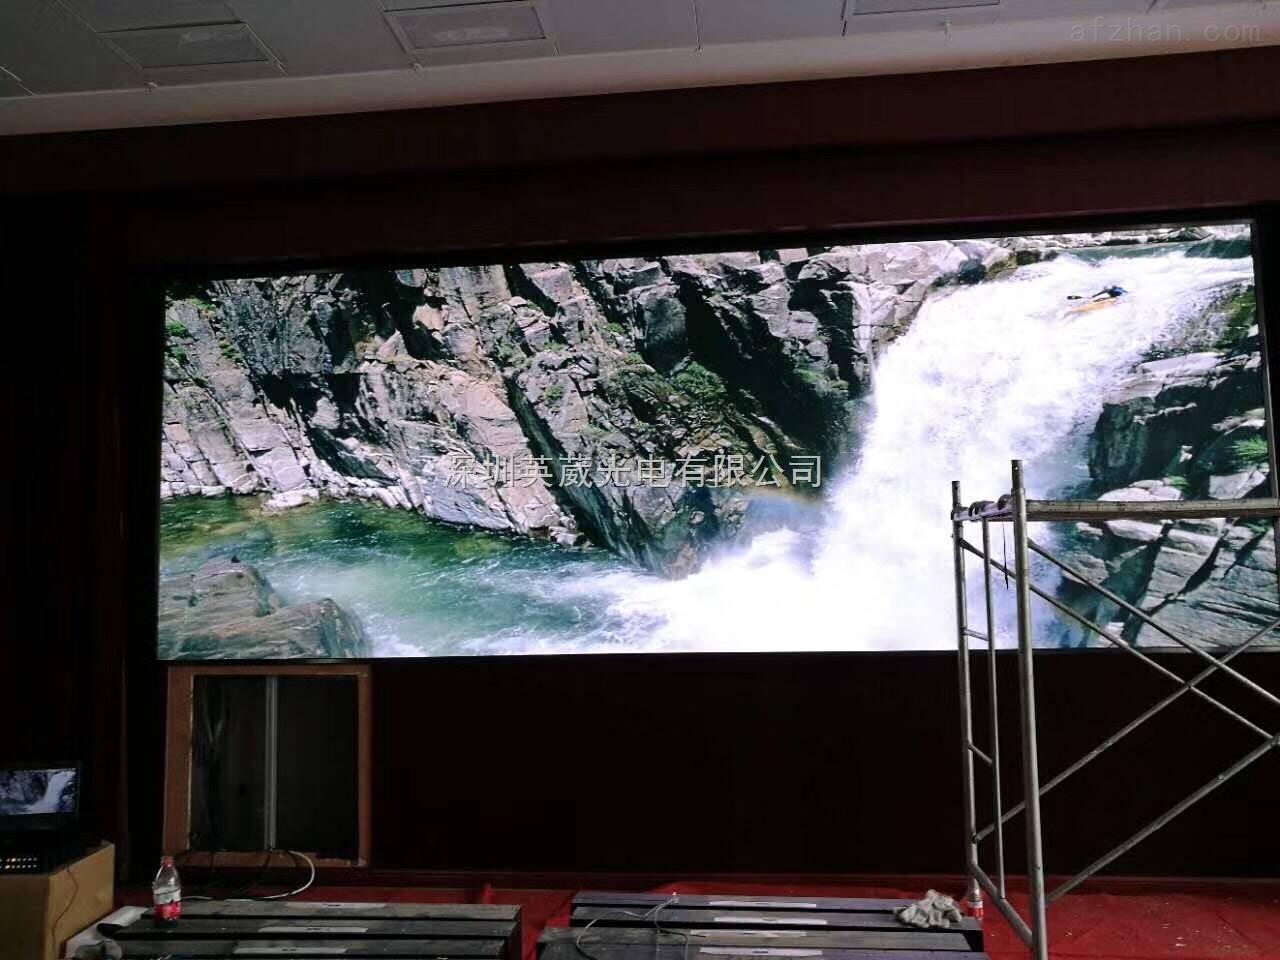 p2室内高清led显示大屏幕